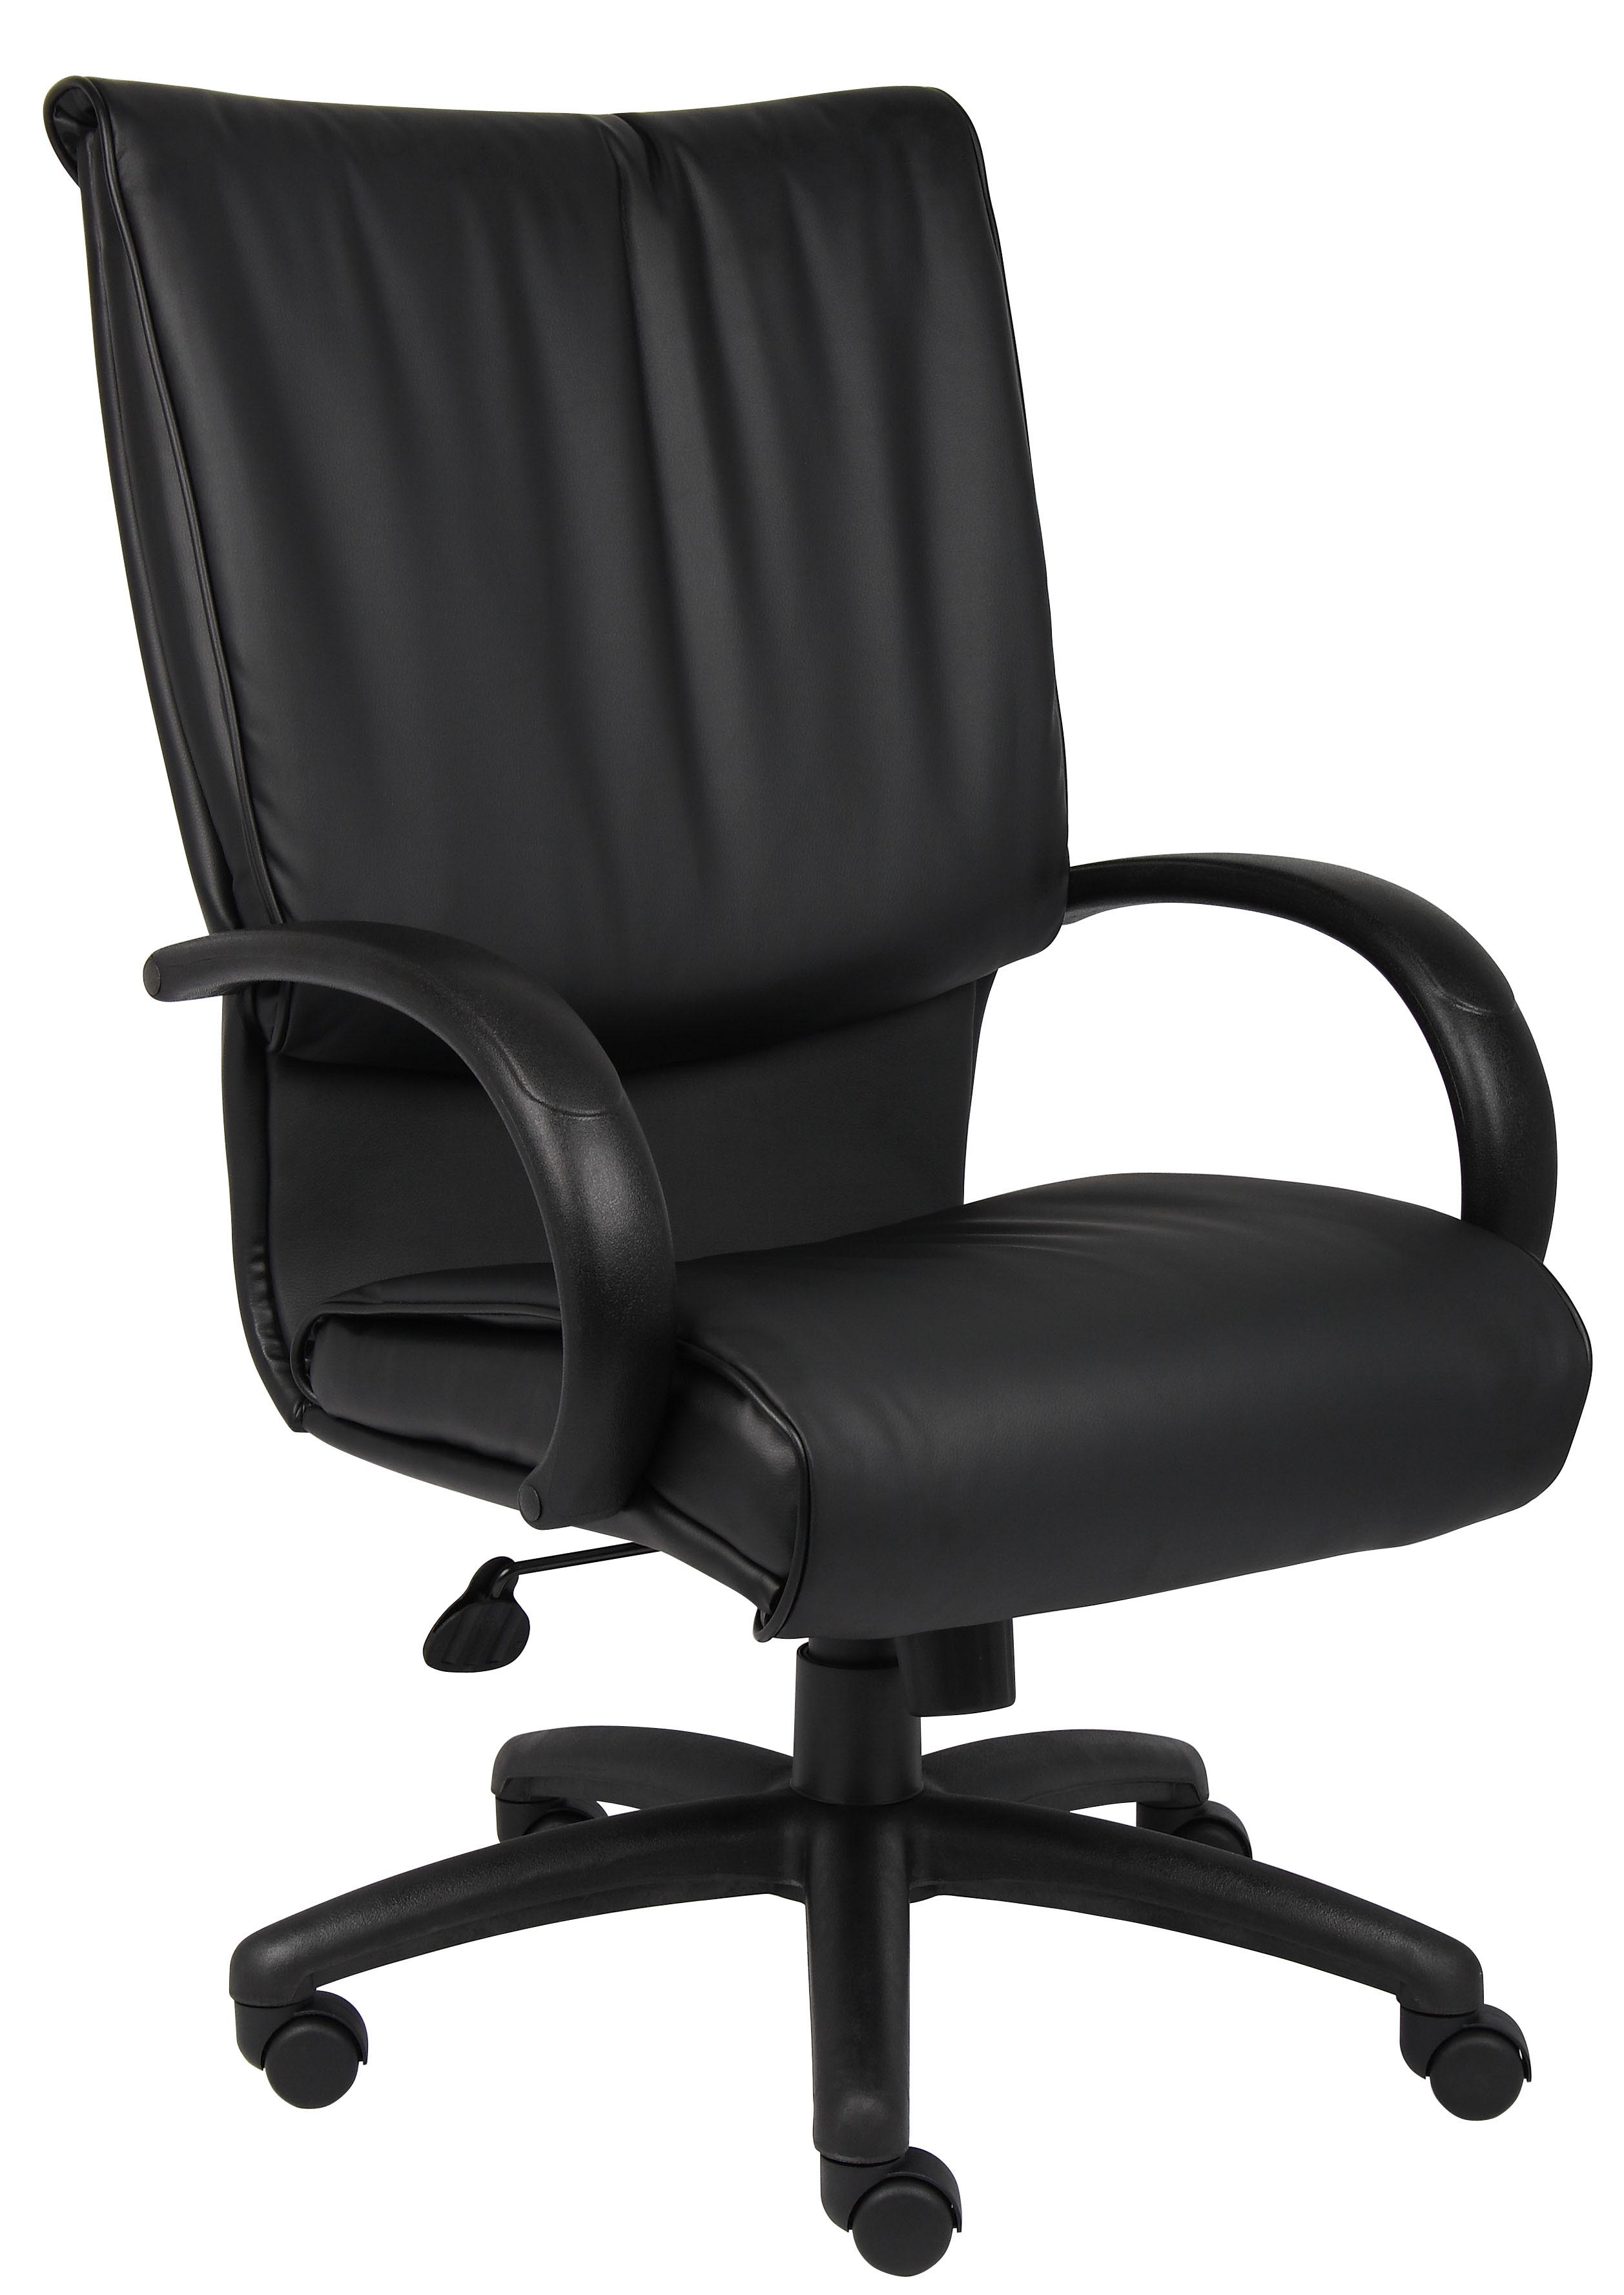 Boss High Back Black LeatherPlus Executive Chair B9701 Ergoback